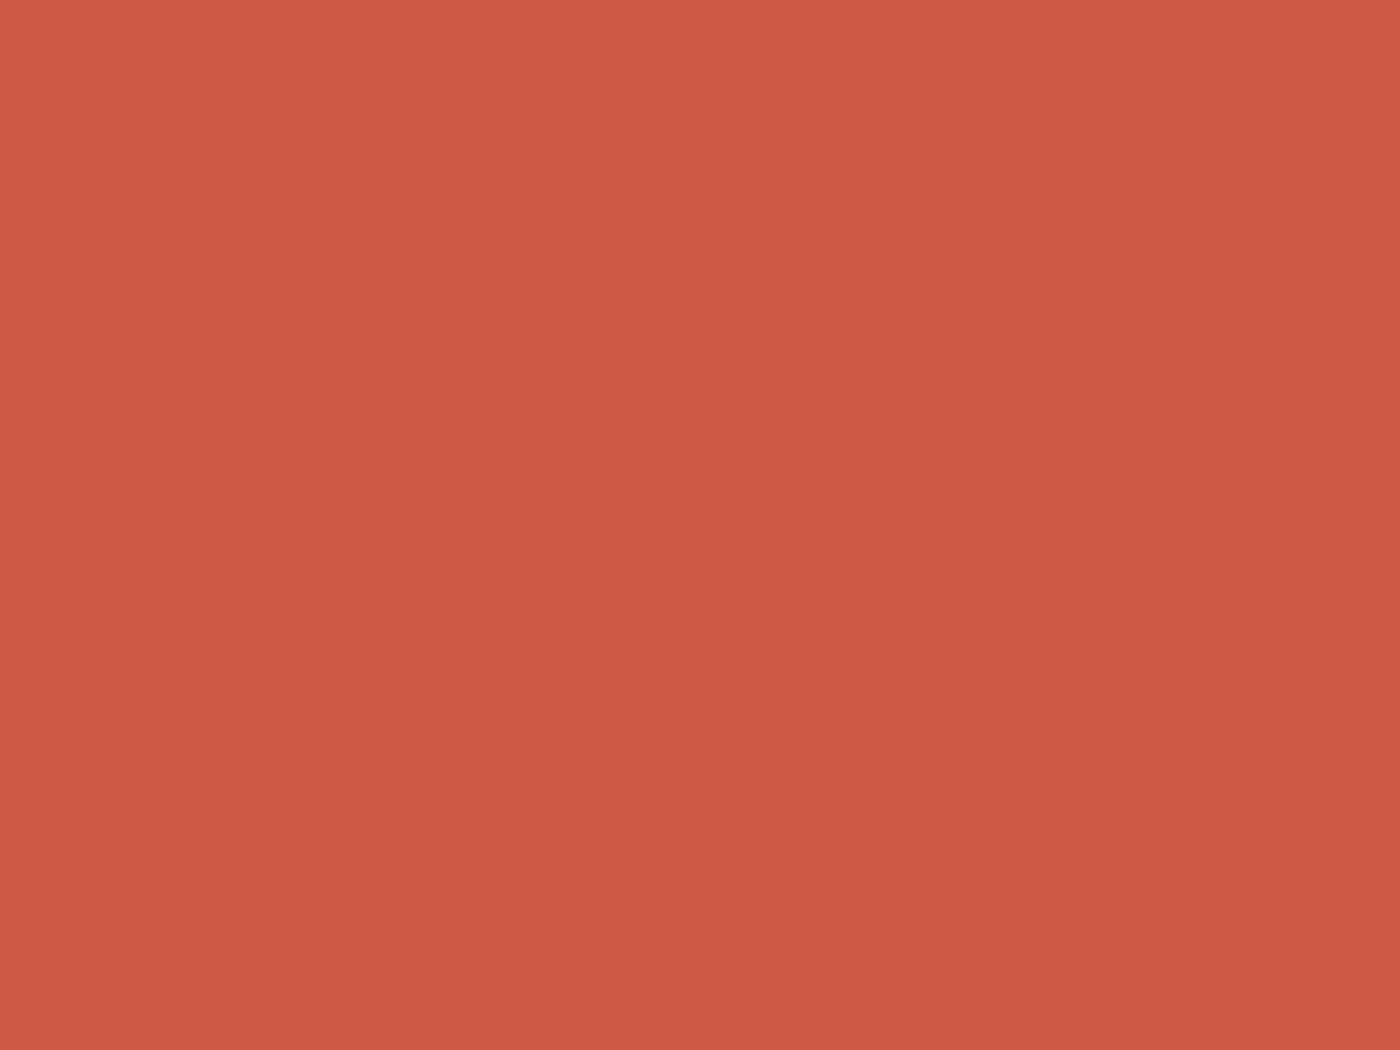 1400x1050 Dark Coral Solid Color Background